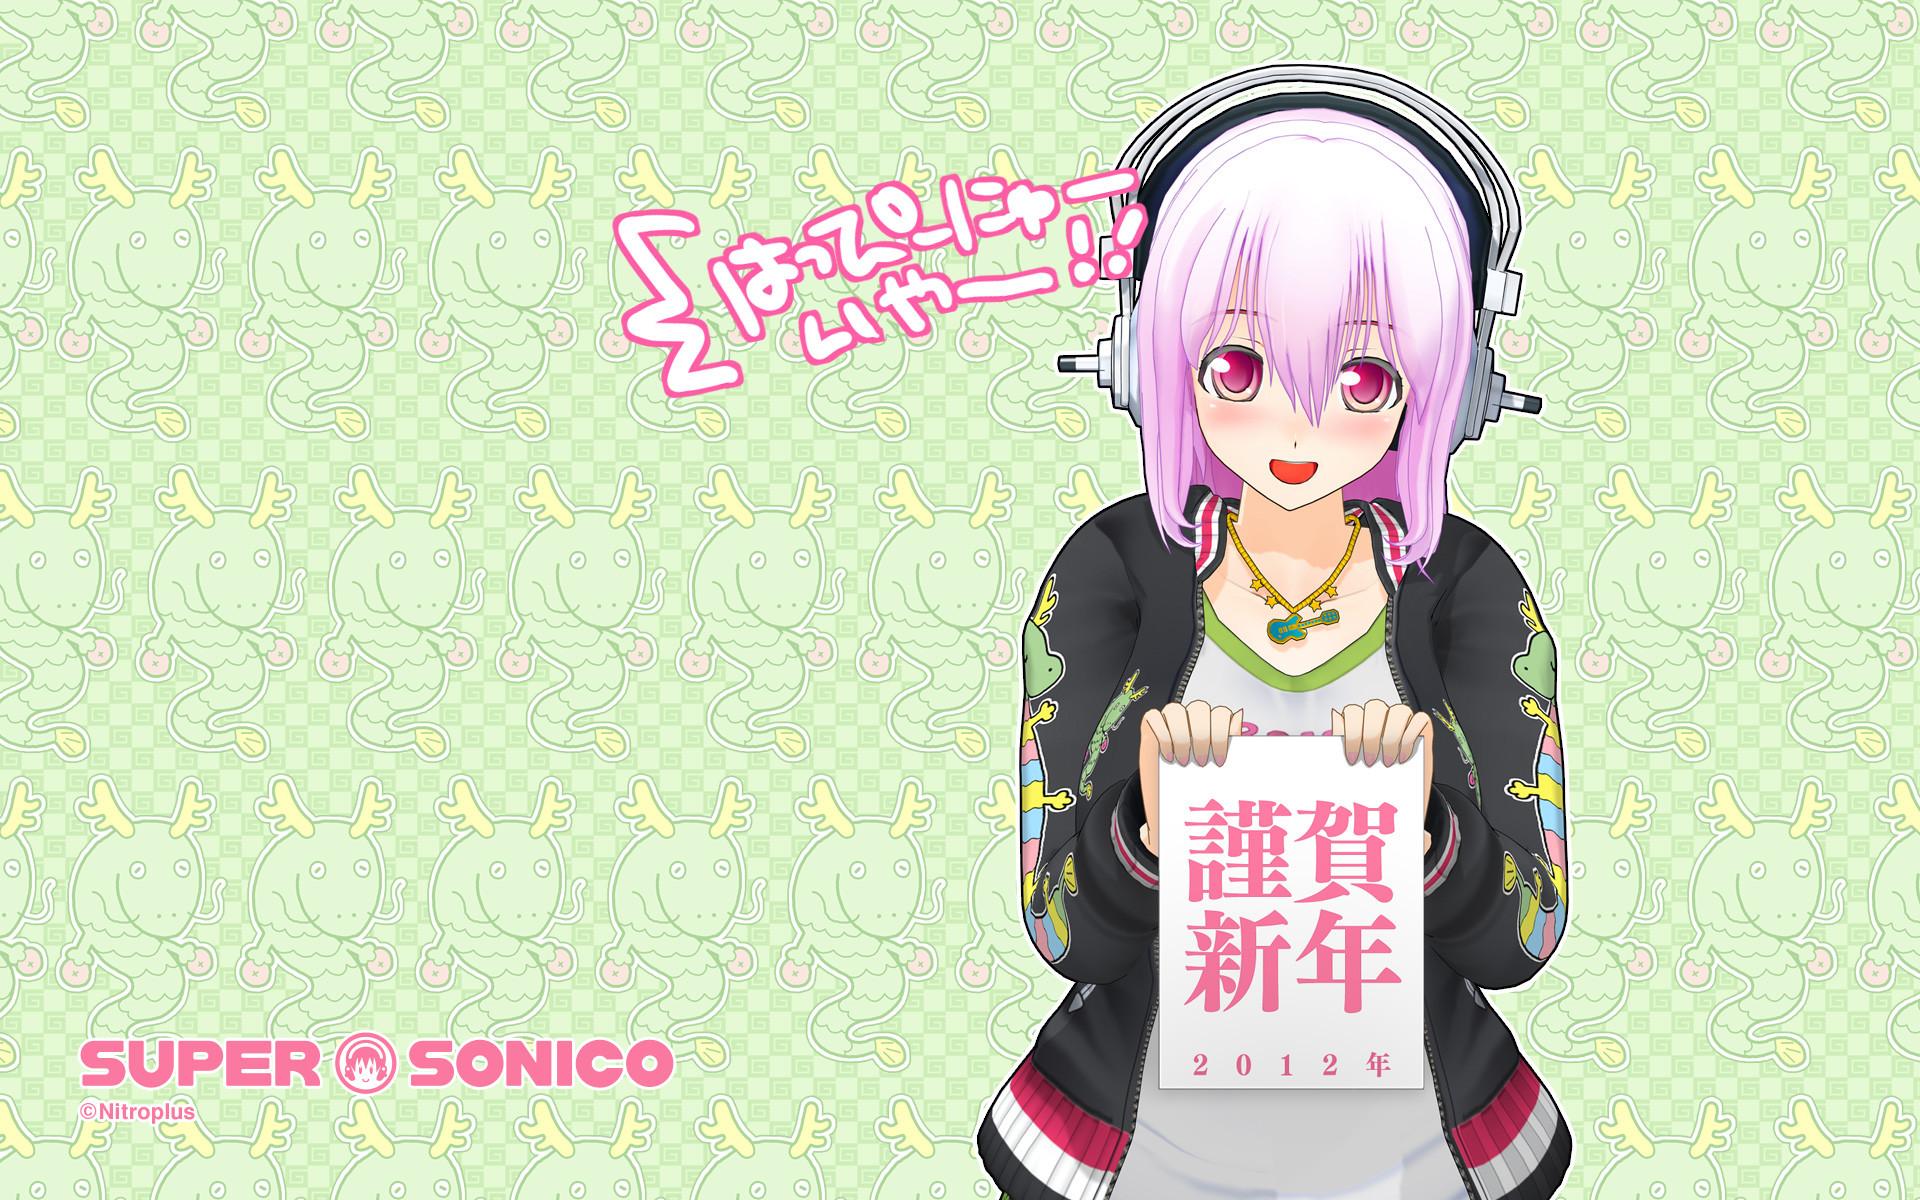 Tags: Anime, Tsuji Santa, Nitro+, Super Sonico, Sonico, Wallpaper,